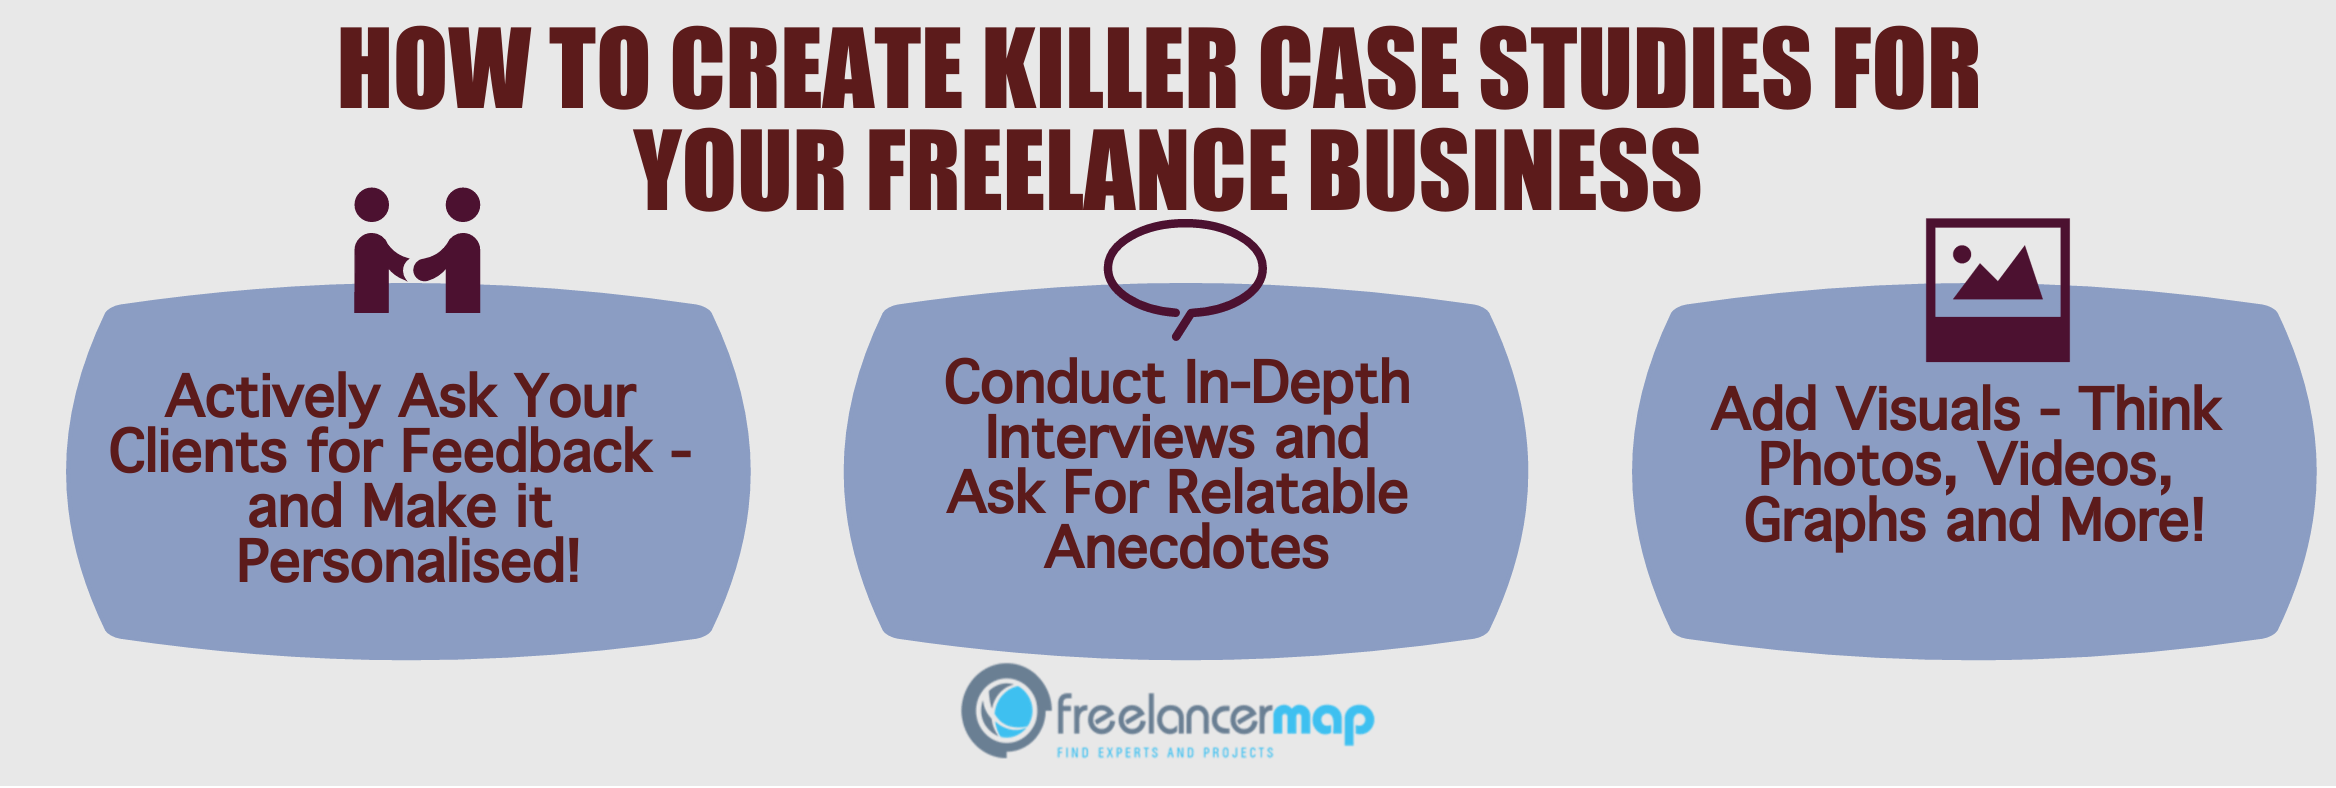 Buy a customized case study